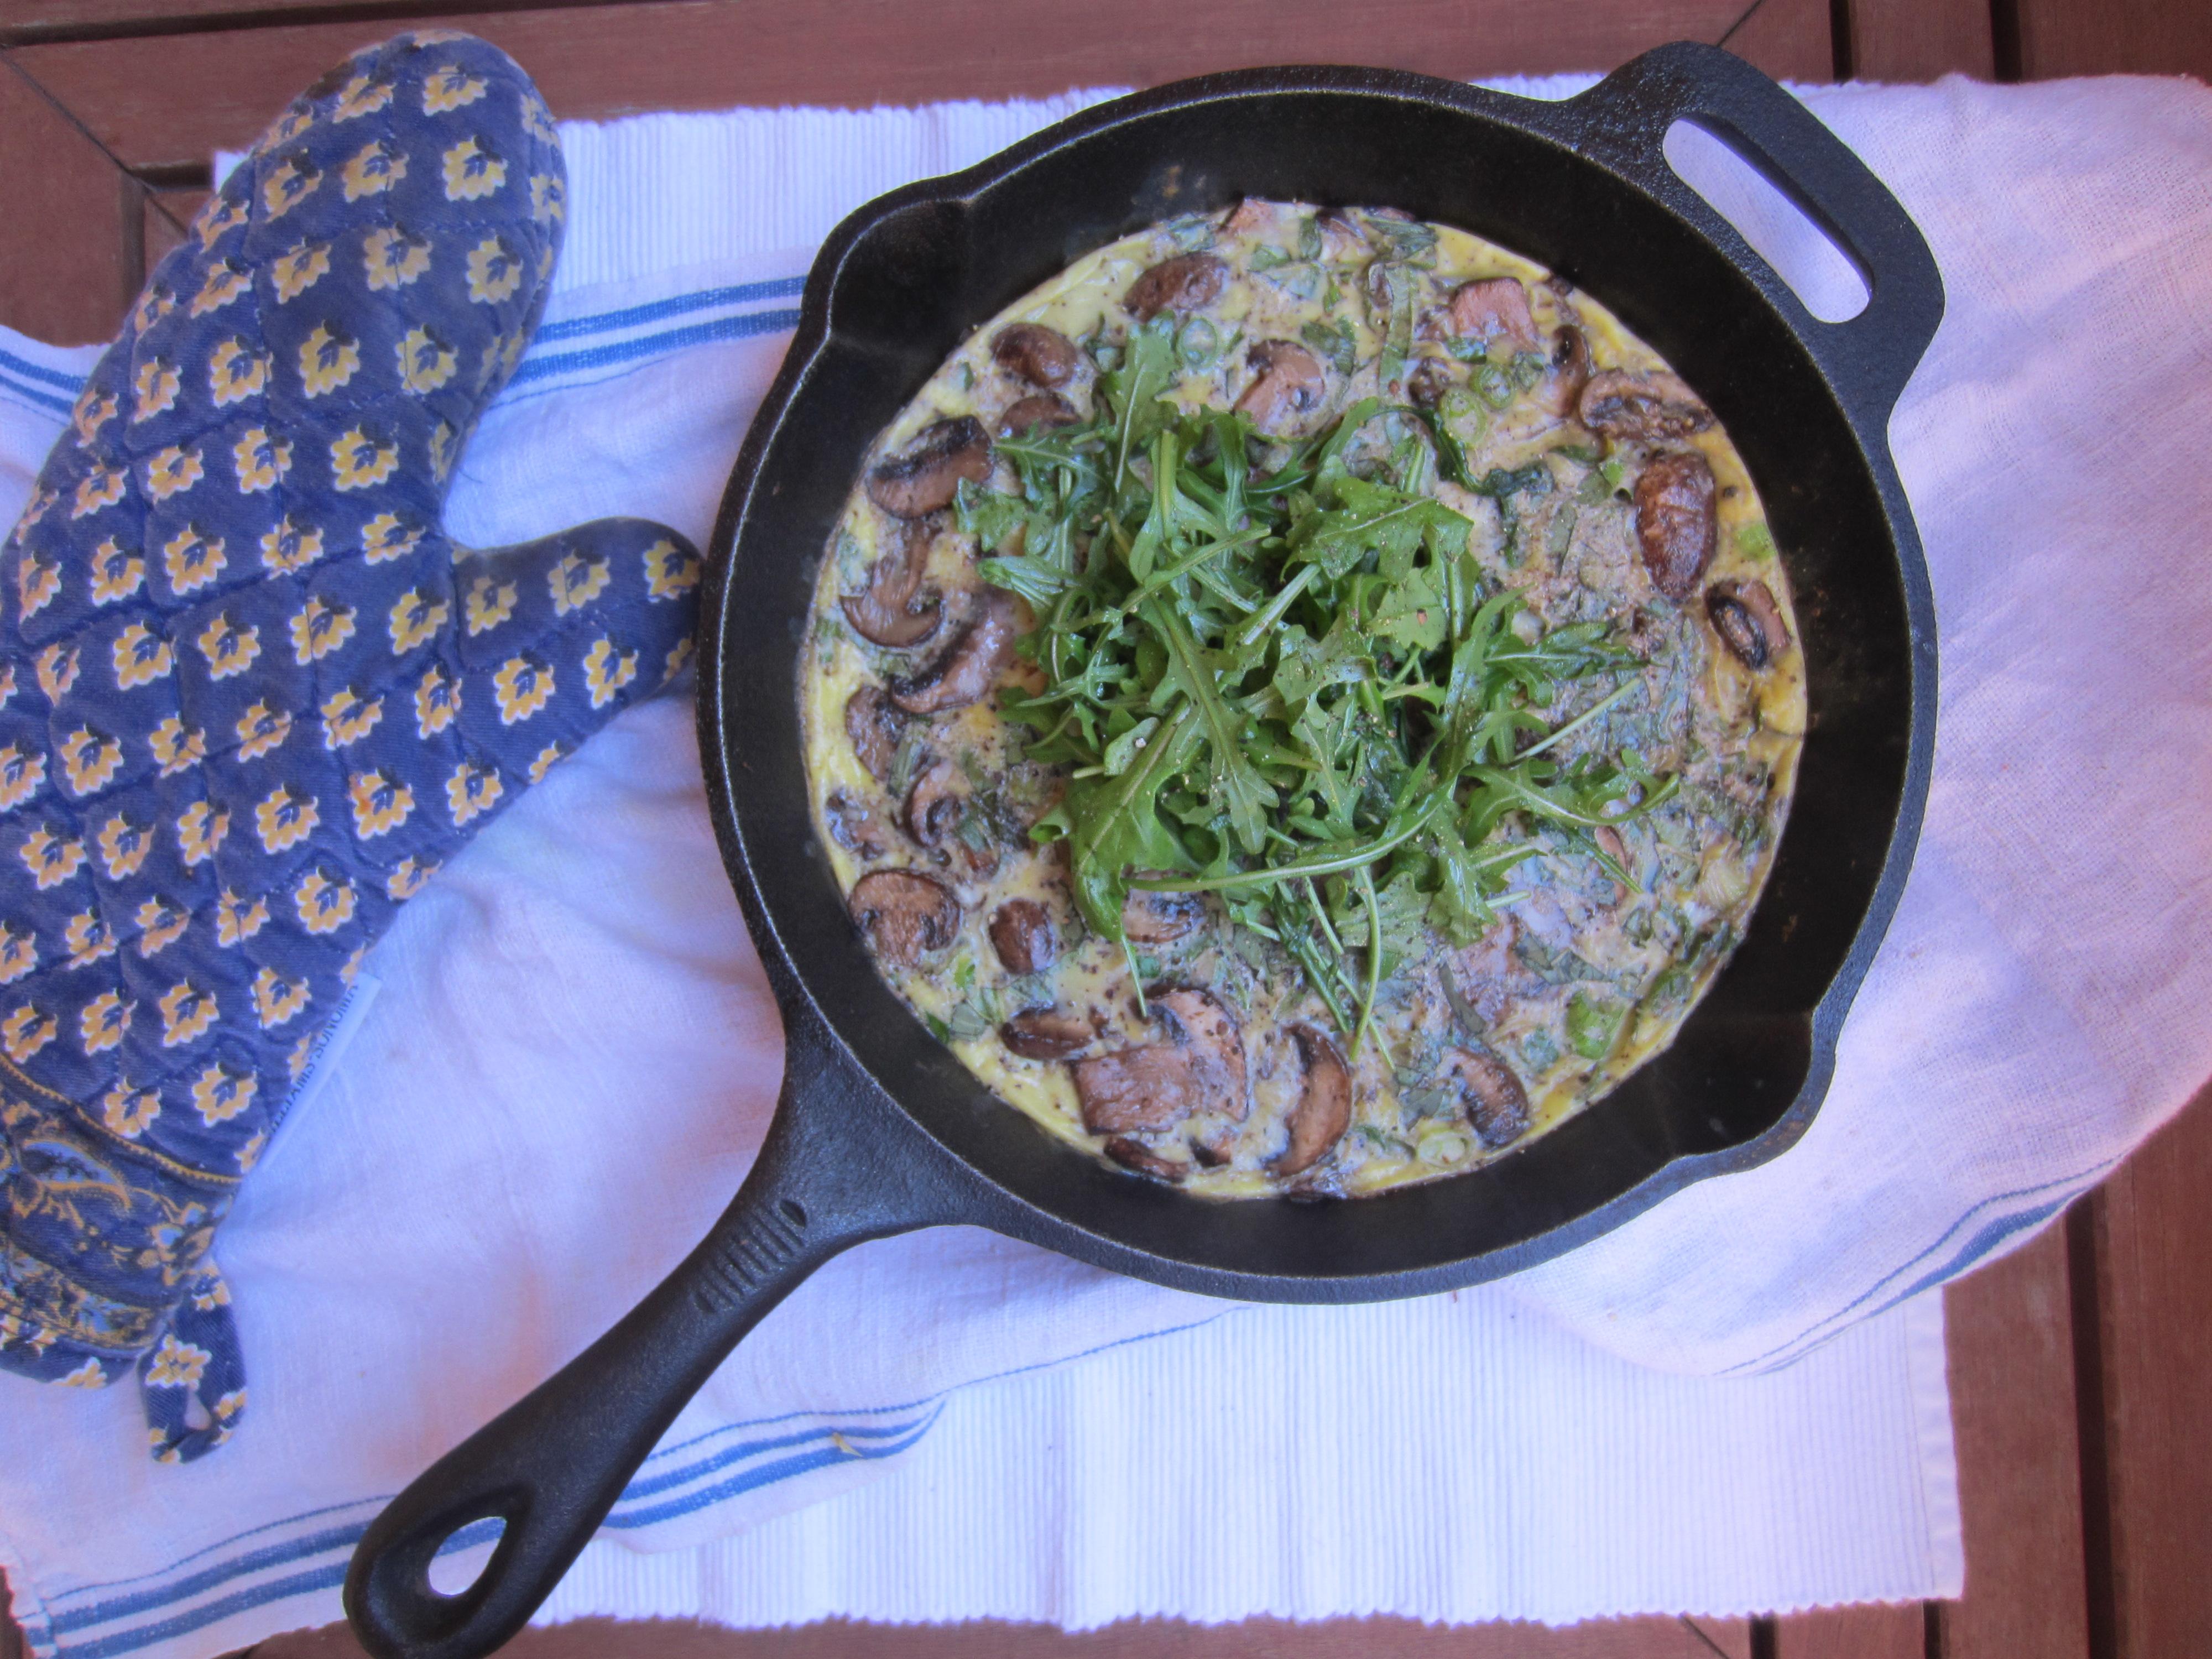 Mushroom Frittata adapted from @Cooking Light from www.meganopel.com